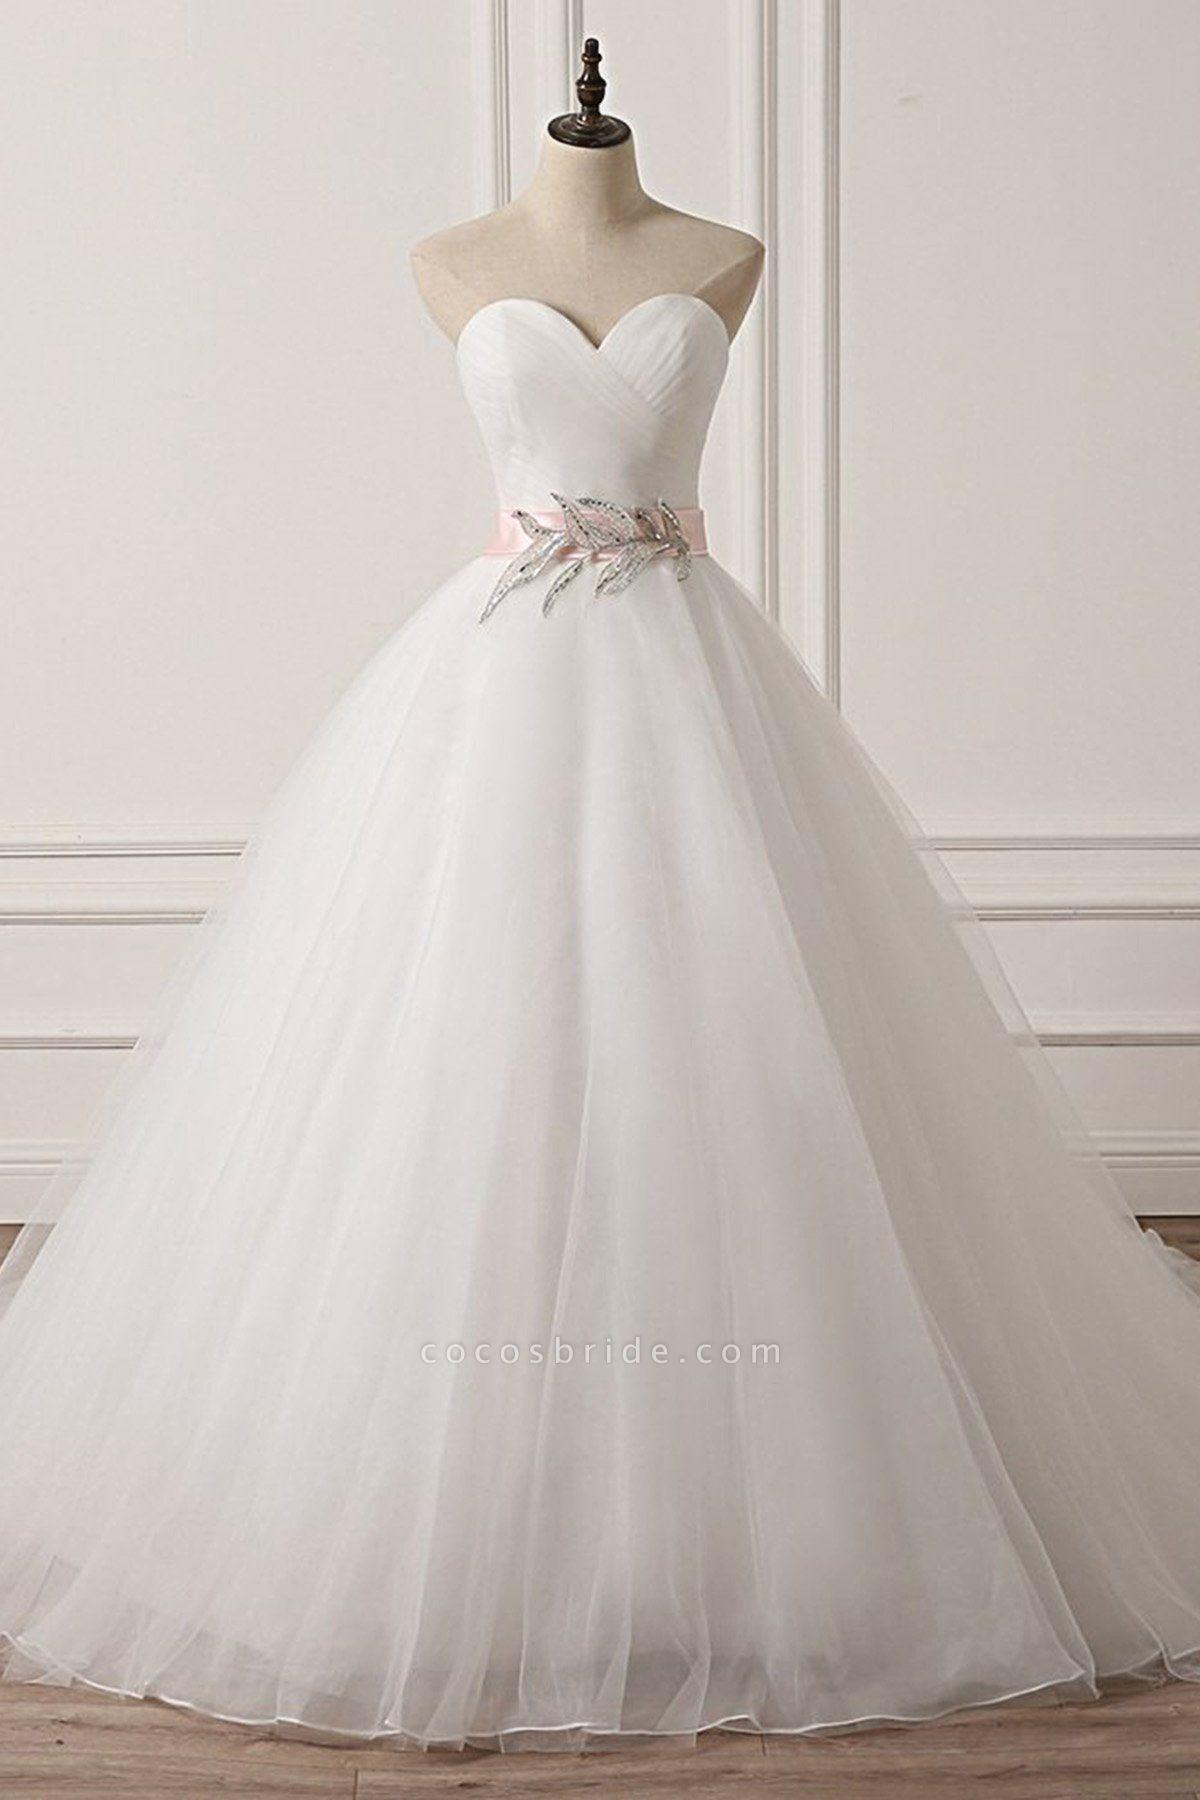 White Tulle Backless Long Beaded Applique Long Wedding Dress